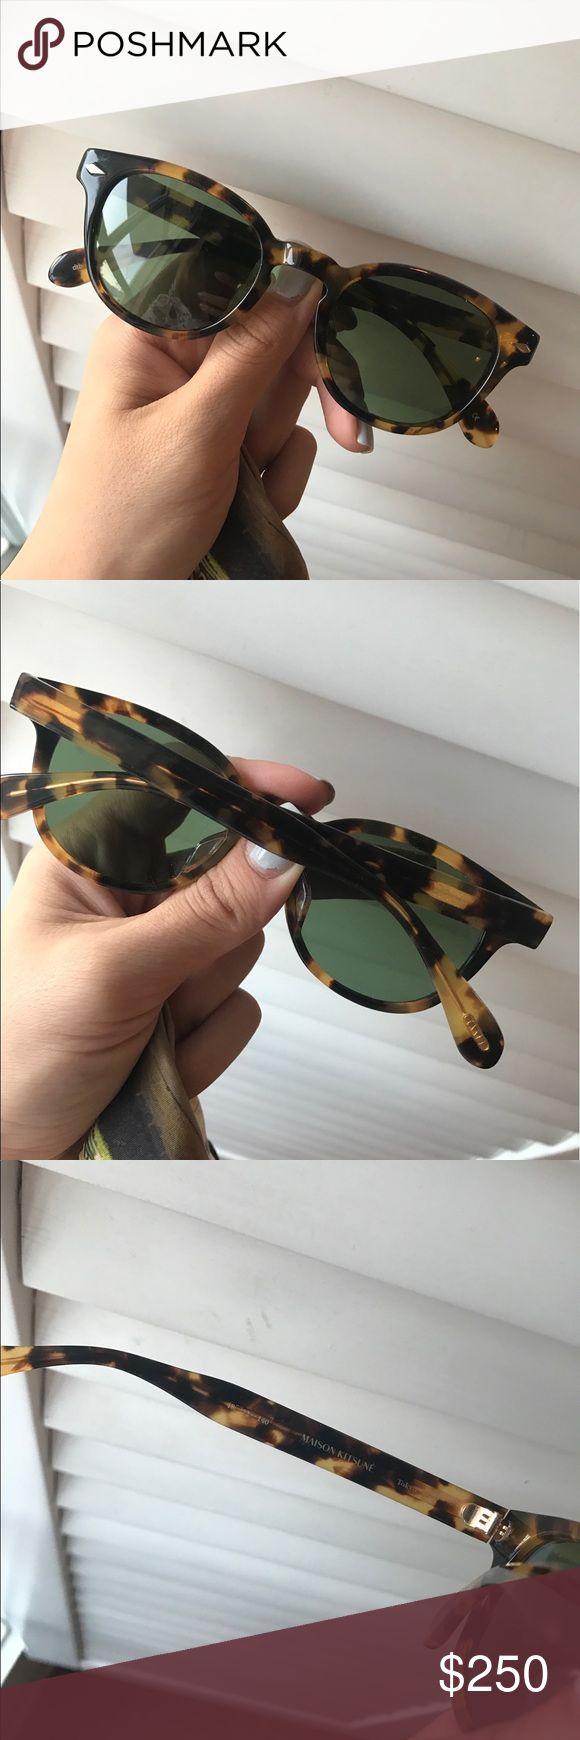 oliver peoples maison kitsune sunglasses Like new Oliver Peoples Accessories Sunglasses